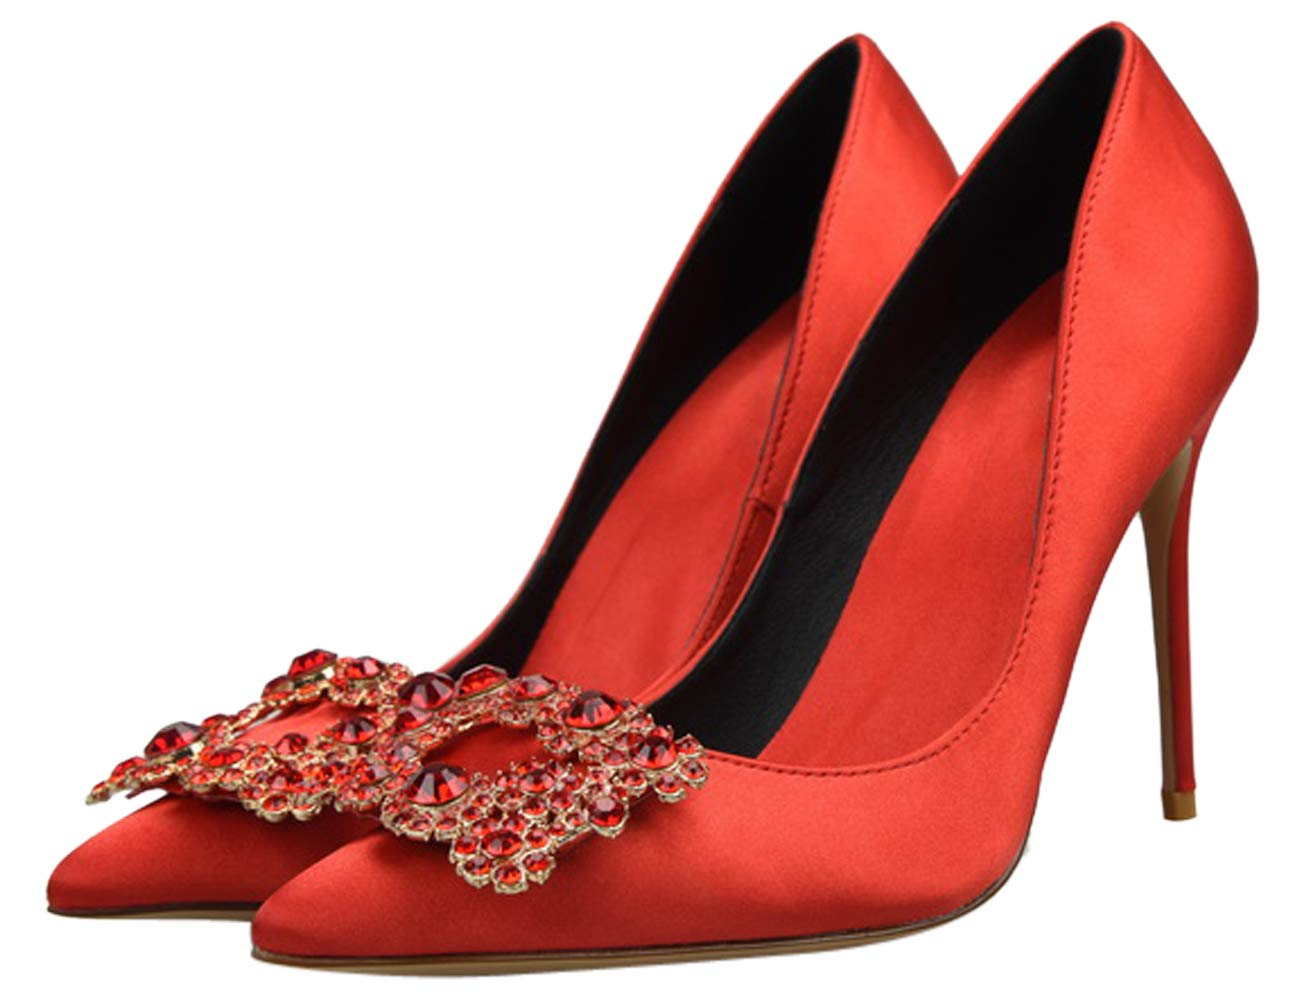 HooH Femme 19914 Escarpins à Chaussures Hauts Talons Soie Tissu Mariée B078SM5GMR Bride Aiguille Strass Bridal Sexy Soirée Robe Chaussures Rouge 741586a - digitalweb.space